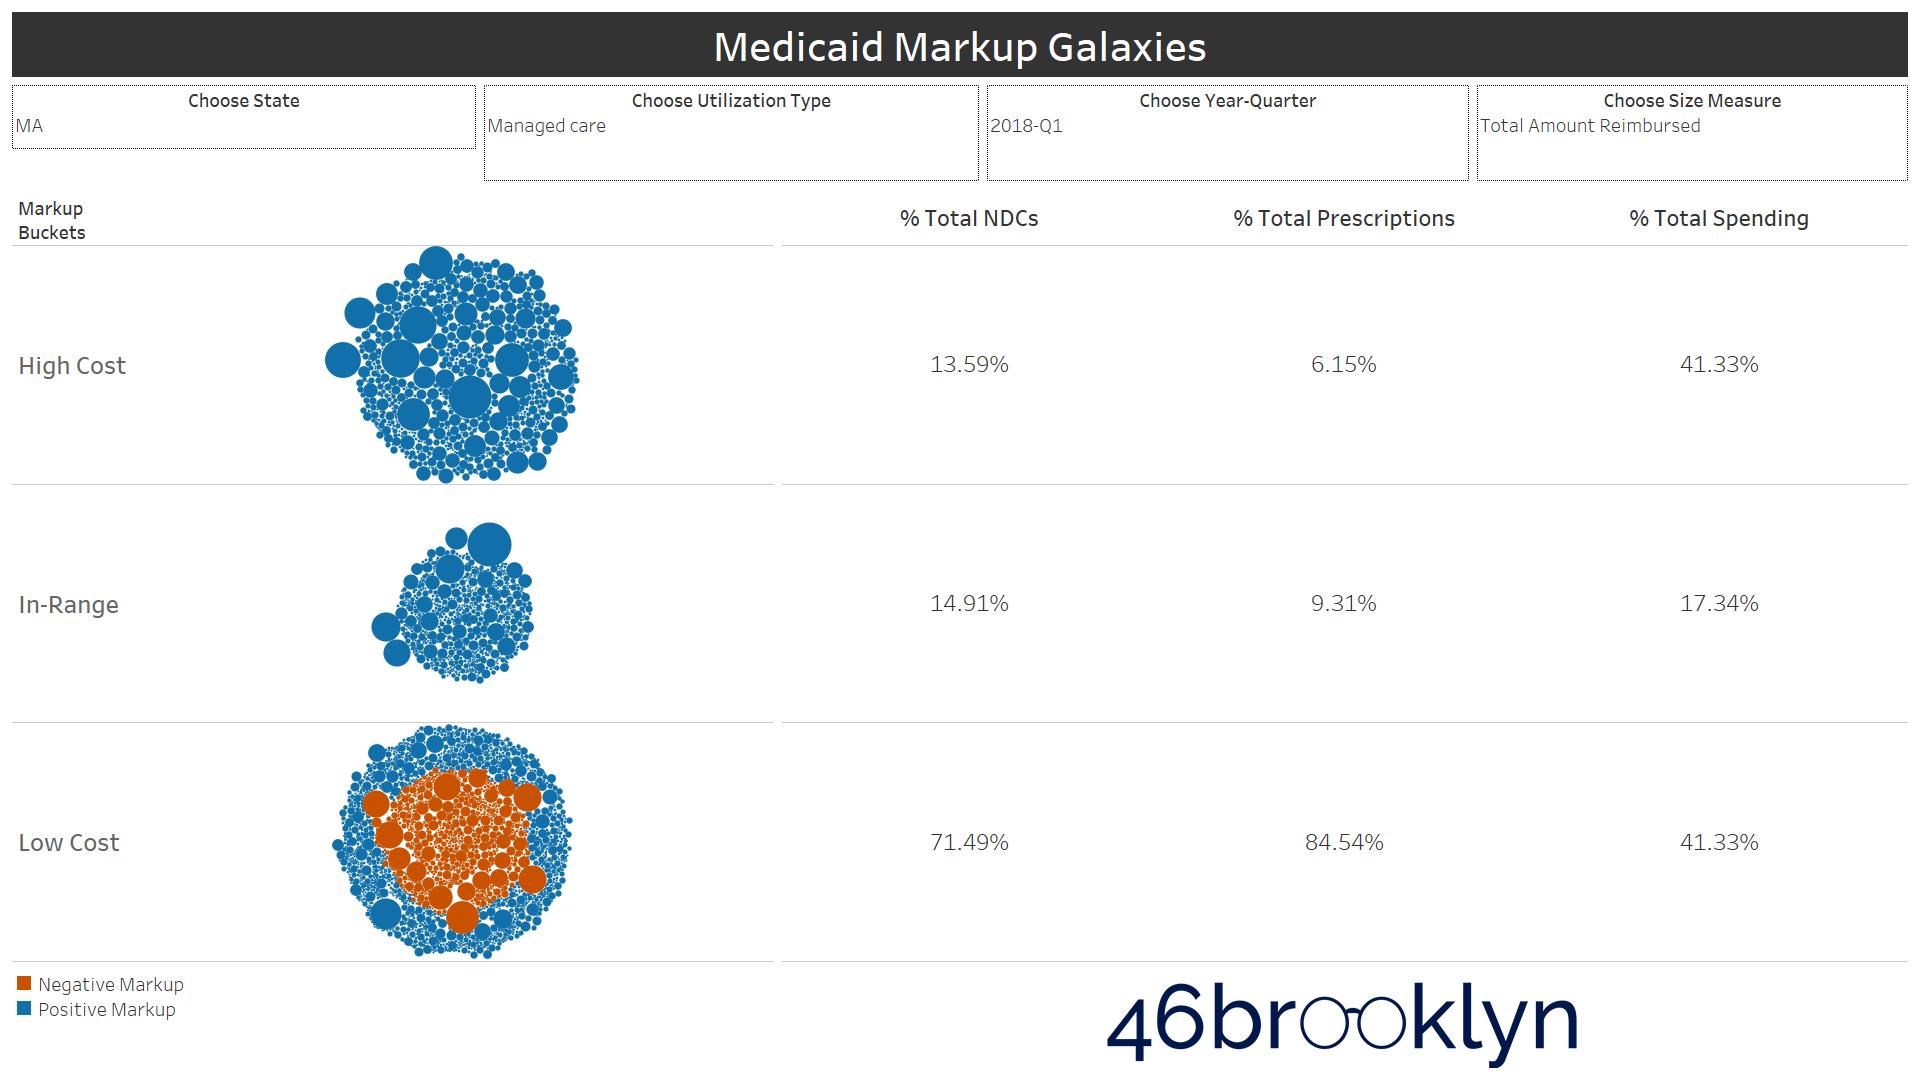 Figure 6   Source: Data.Medicaid.gov, 46brooklyn Research